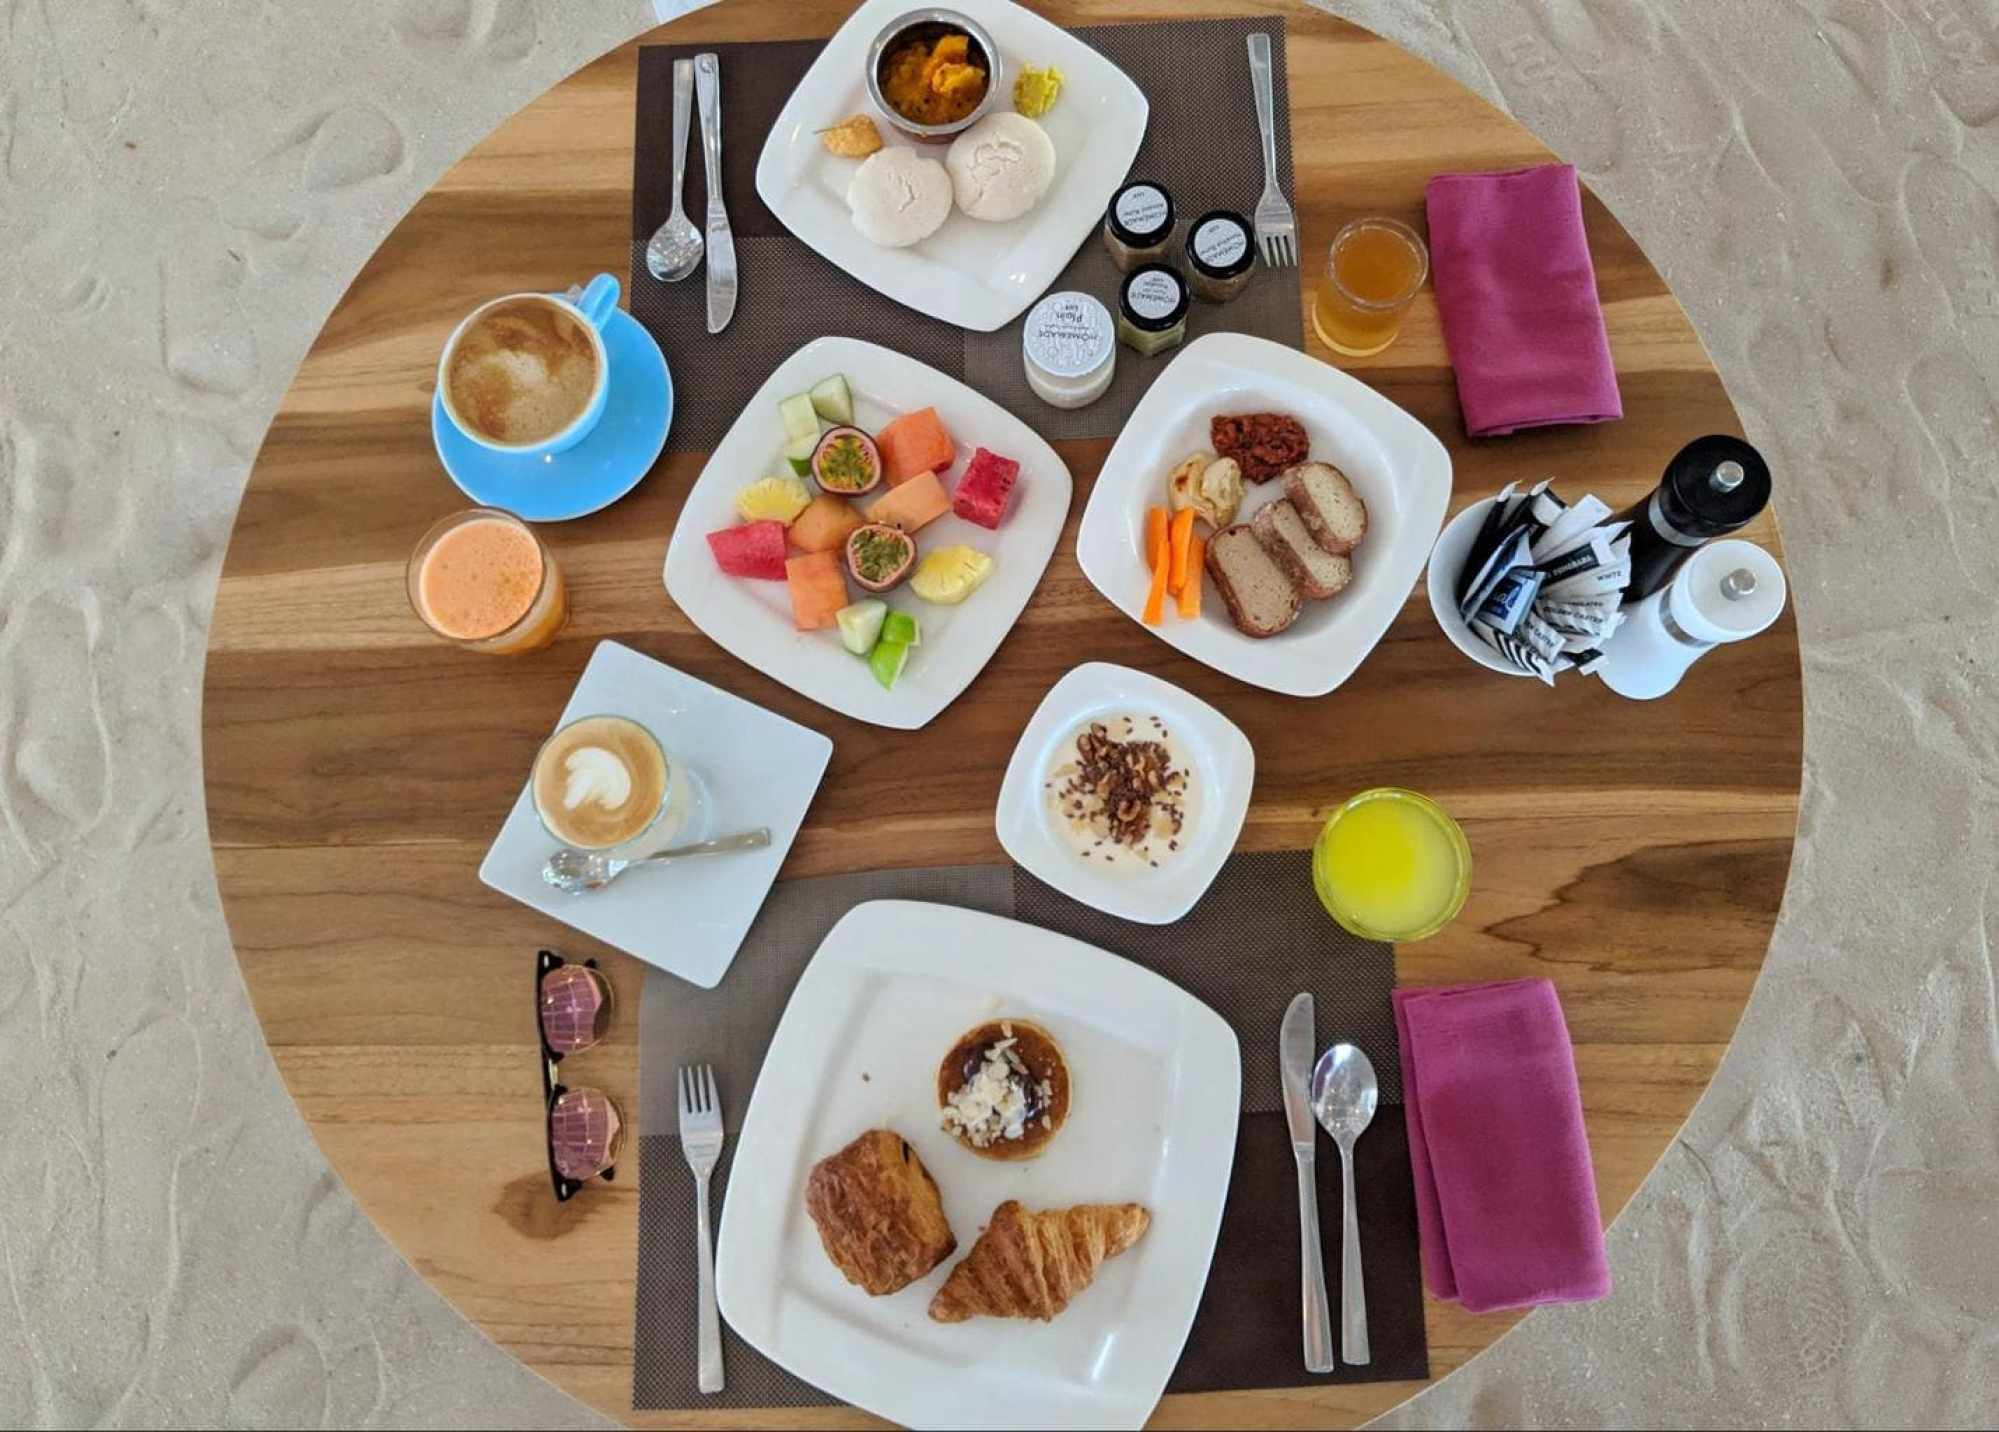 Our breakfast spread